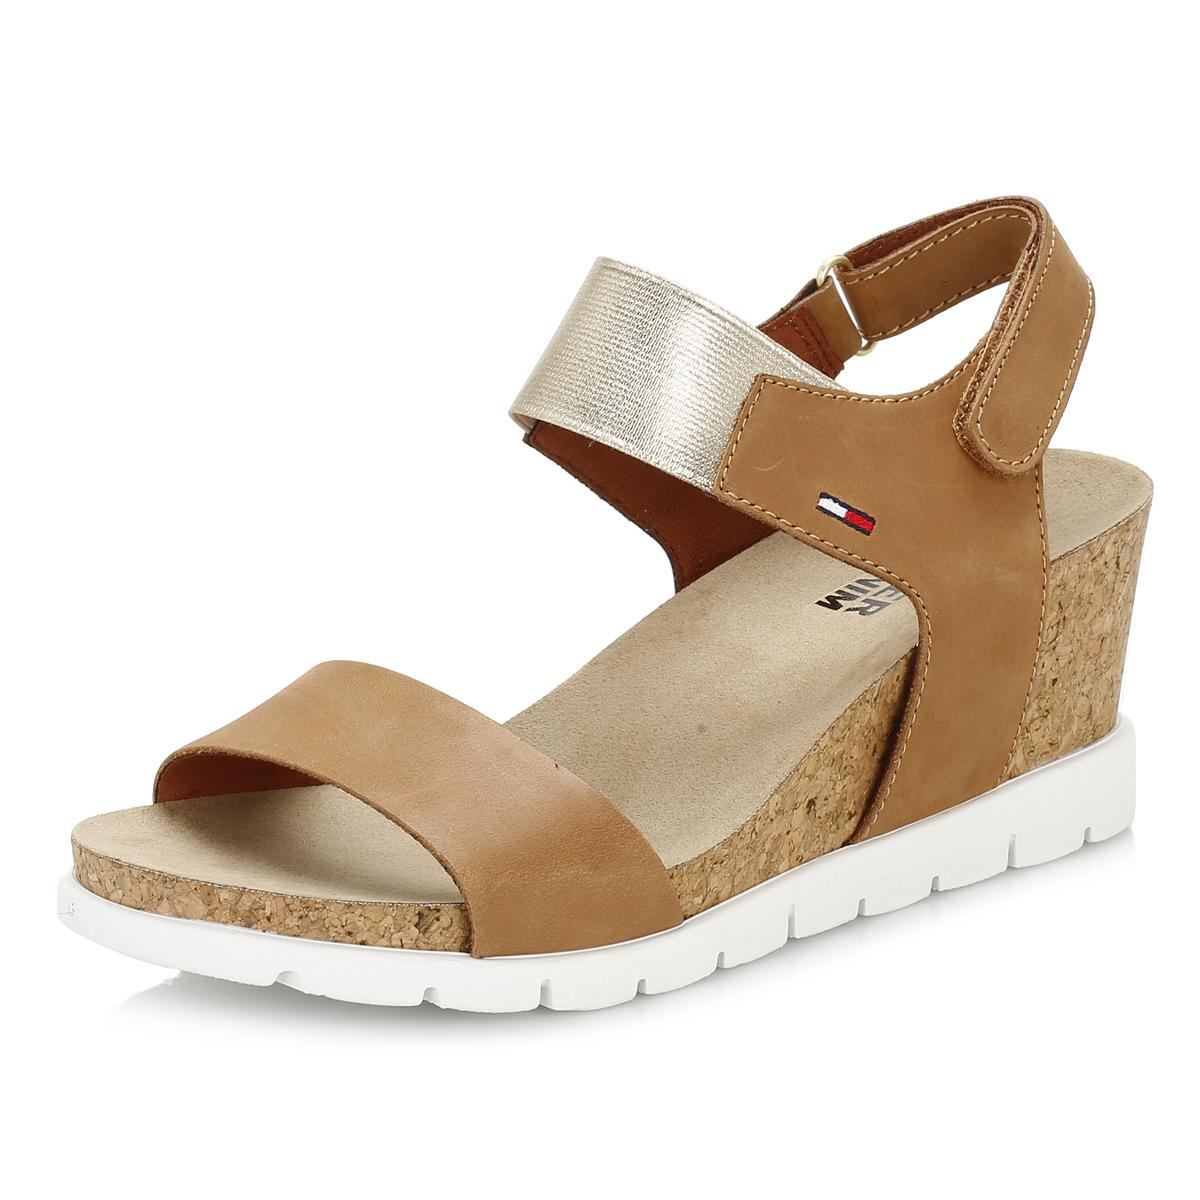 Black Wedge Summer Shoes